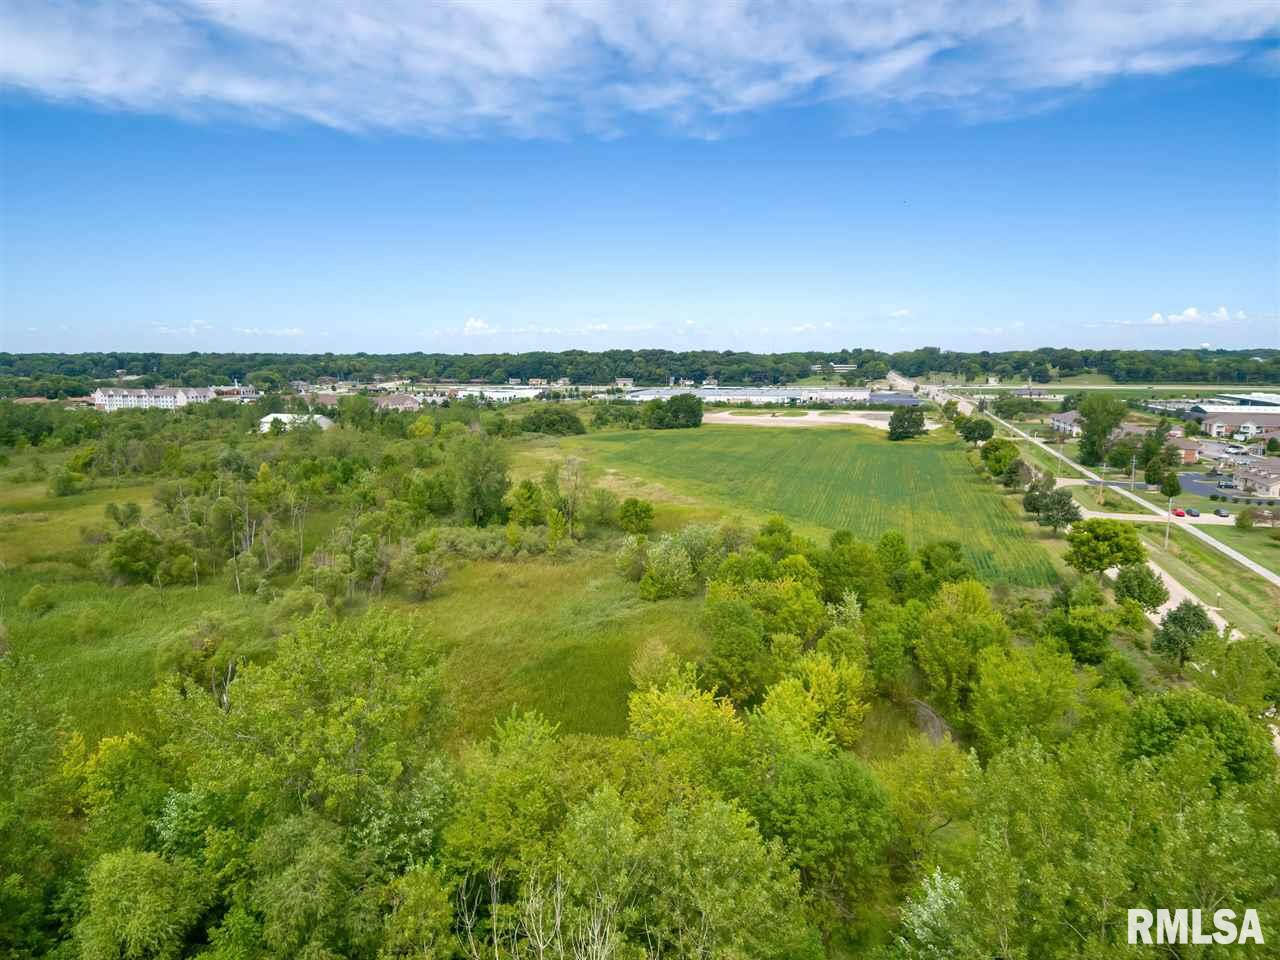 4701 60TH Property Photo - Moline, IL real estate listing